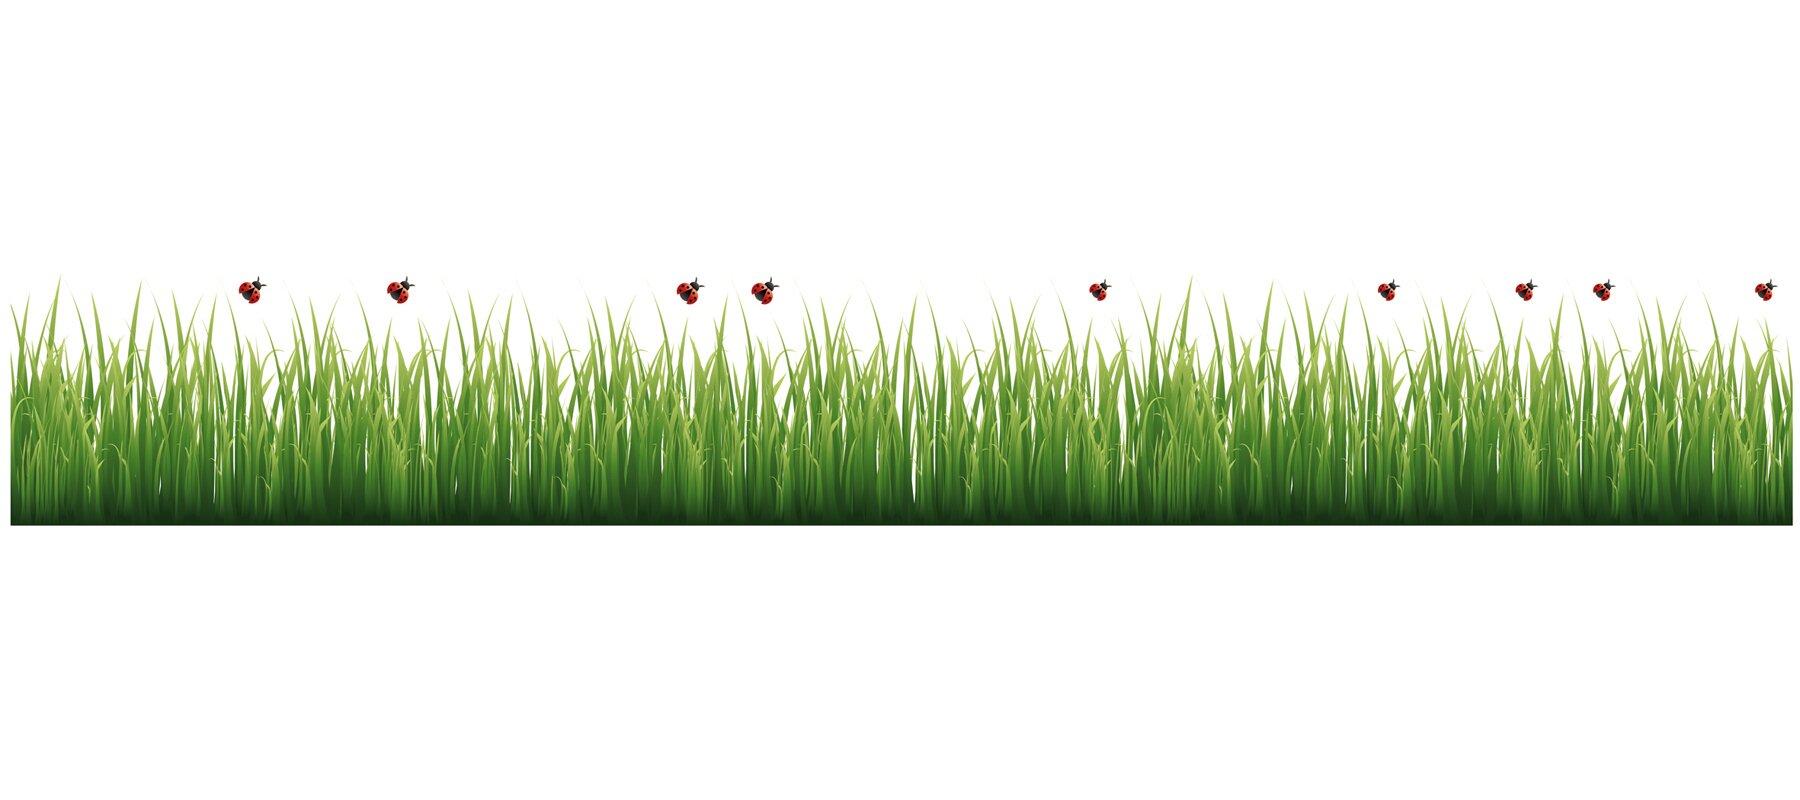 WallPops Grass And Ladybugs Border Wall Decal Reviews Wayfair - Wall decals grass